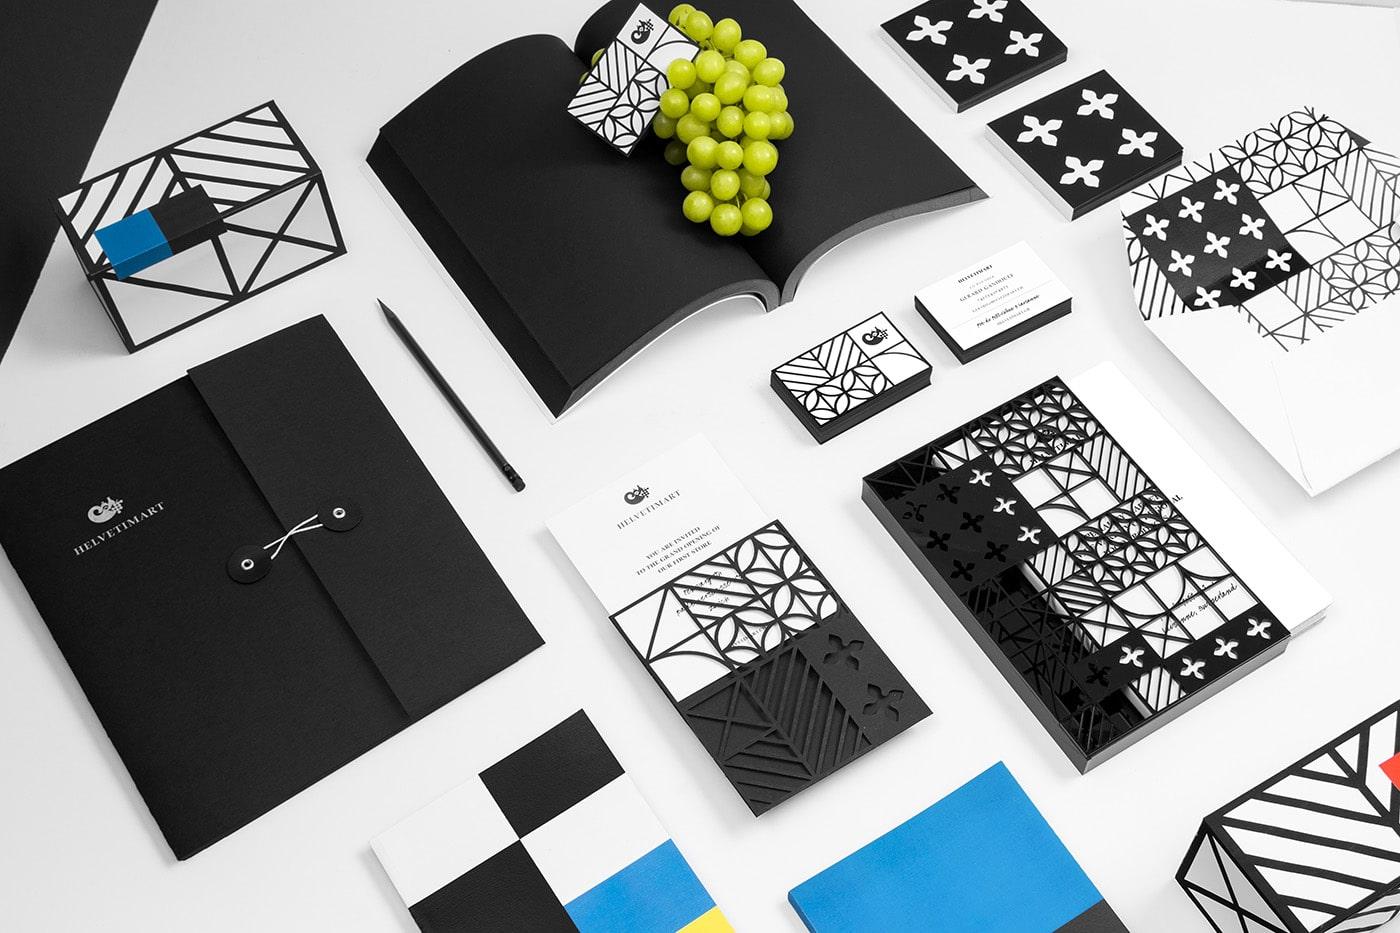 01-Helvetimart-Switzerland-Branding-Packaging-Stationery-Anagrama-Mexico-BP-O